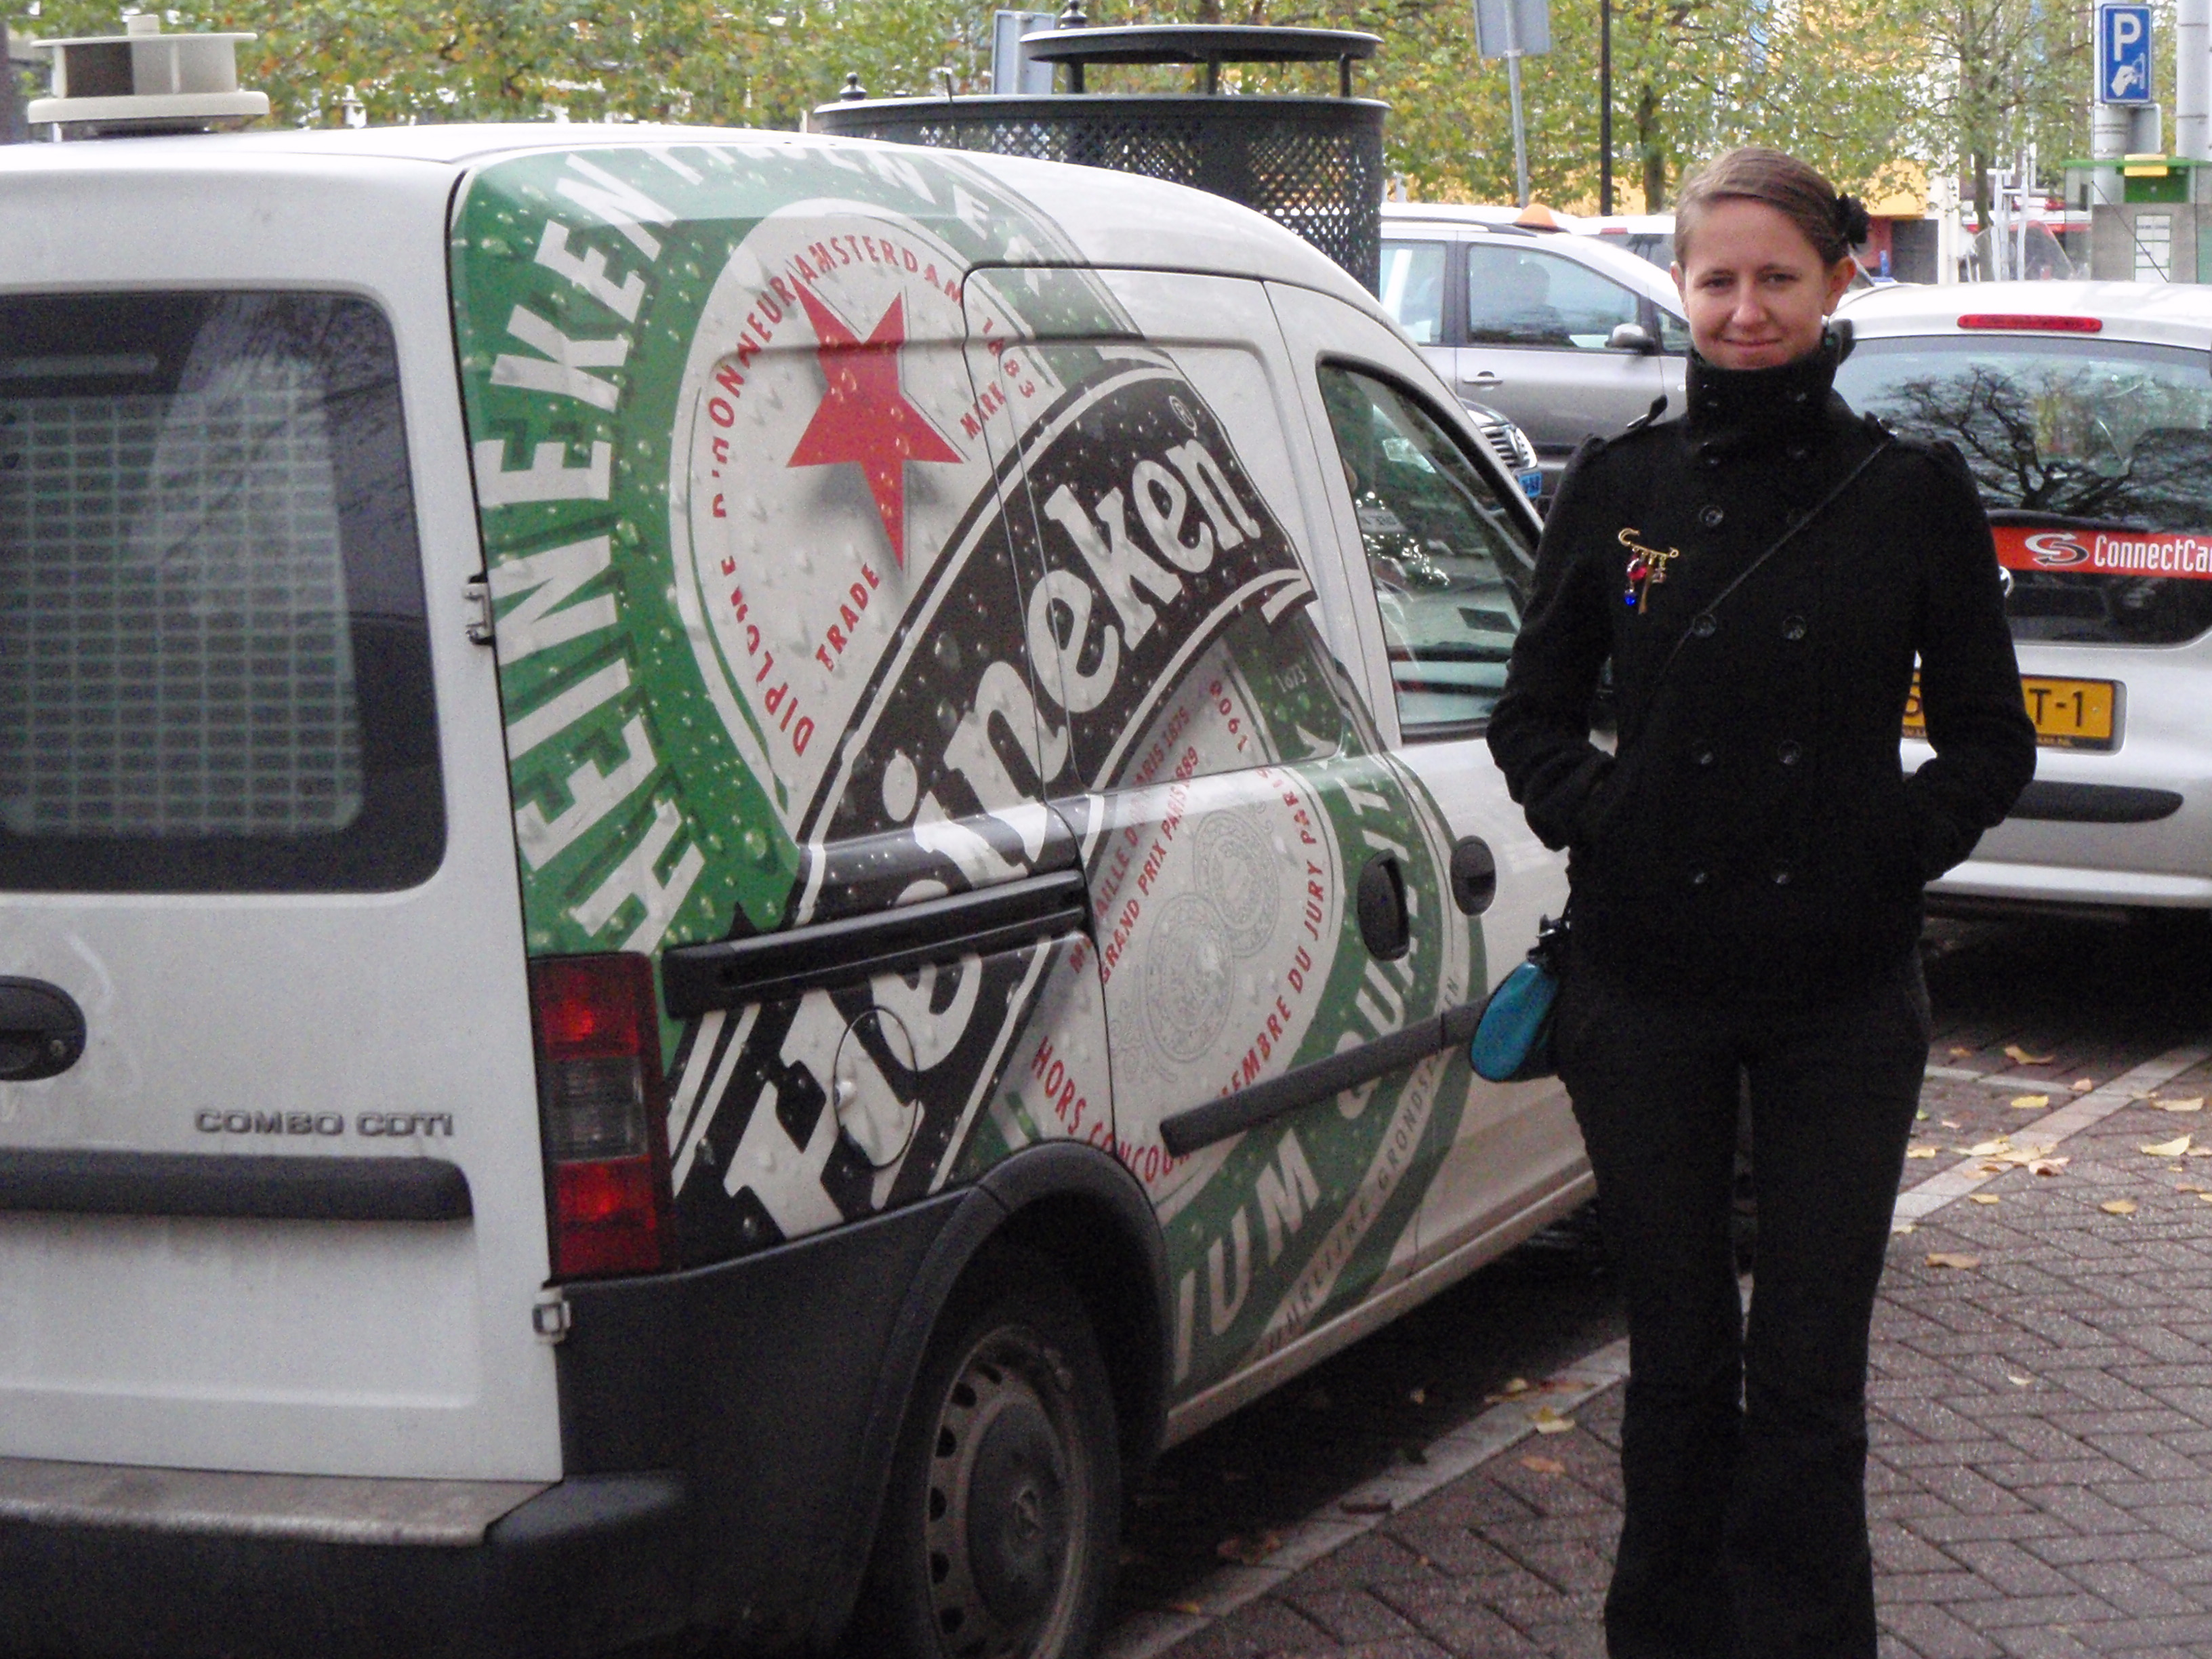 Polish Best Mate, Beata with Heineken Truck; Amsterdam, Netherlands; 2010